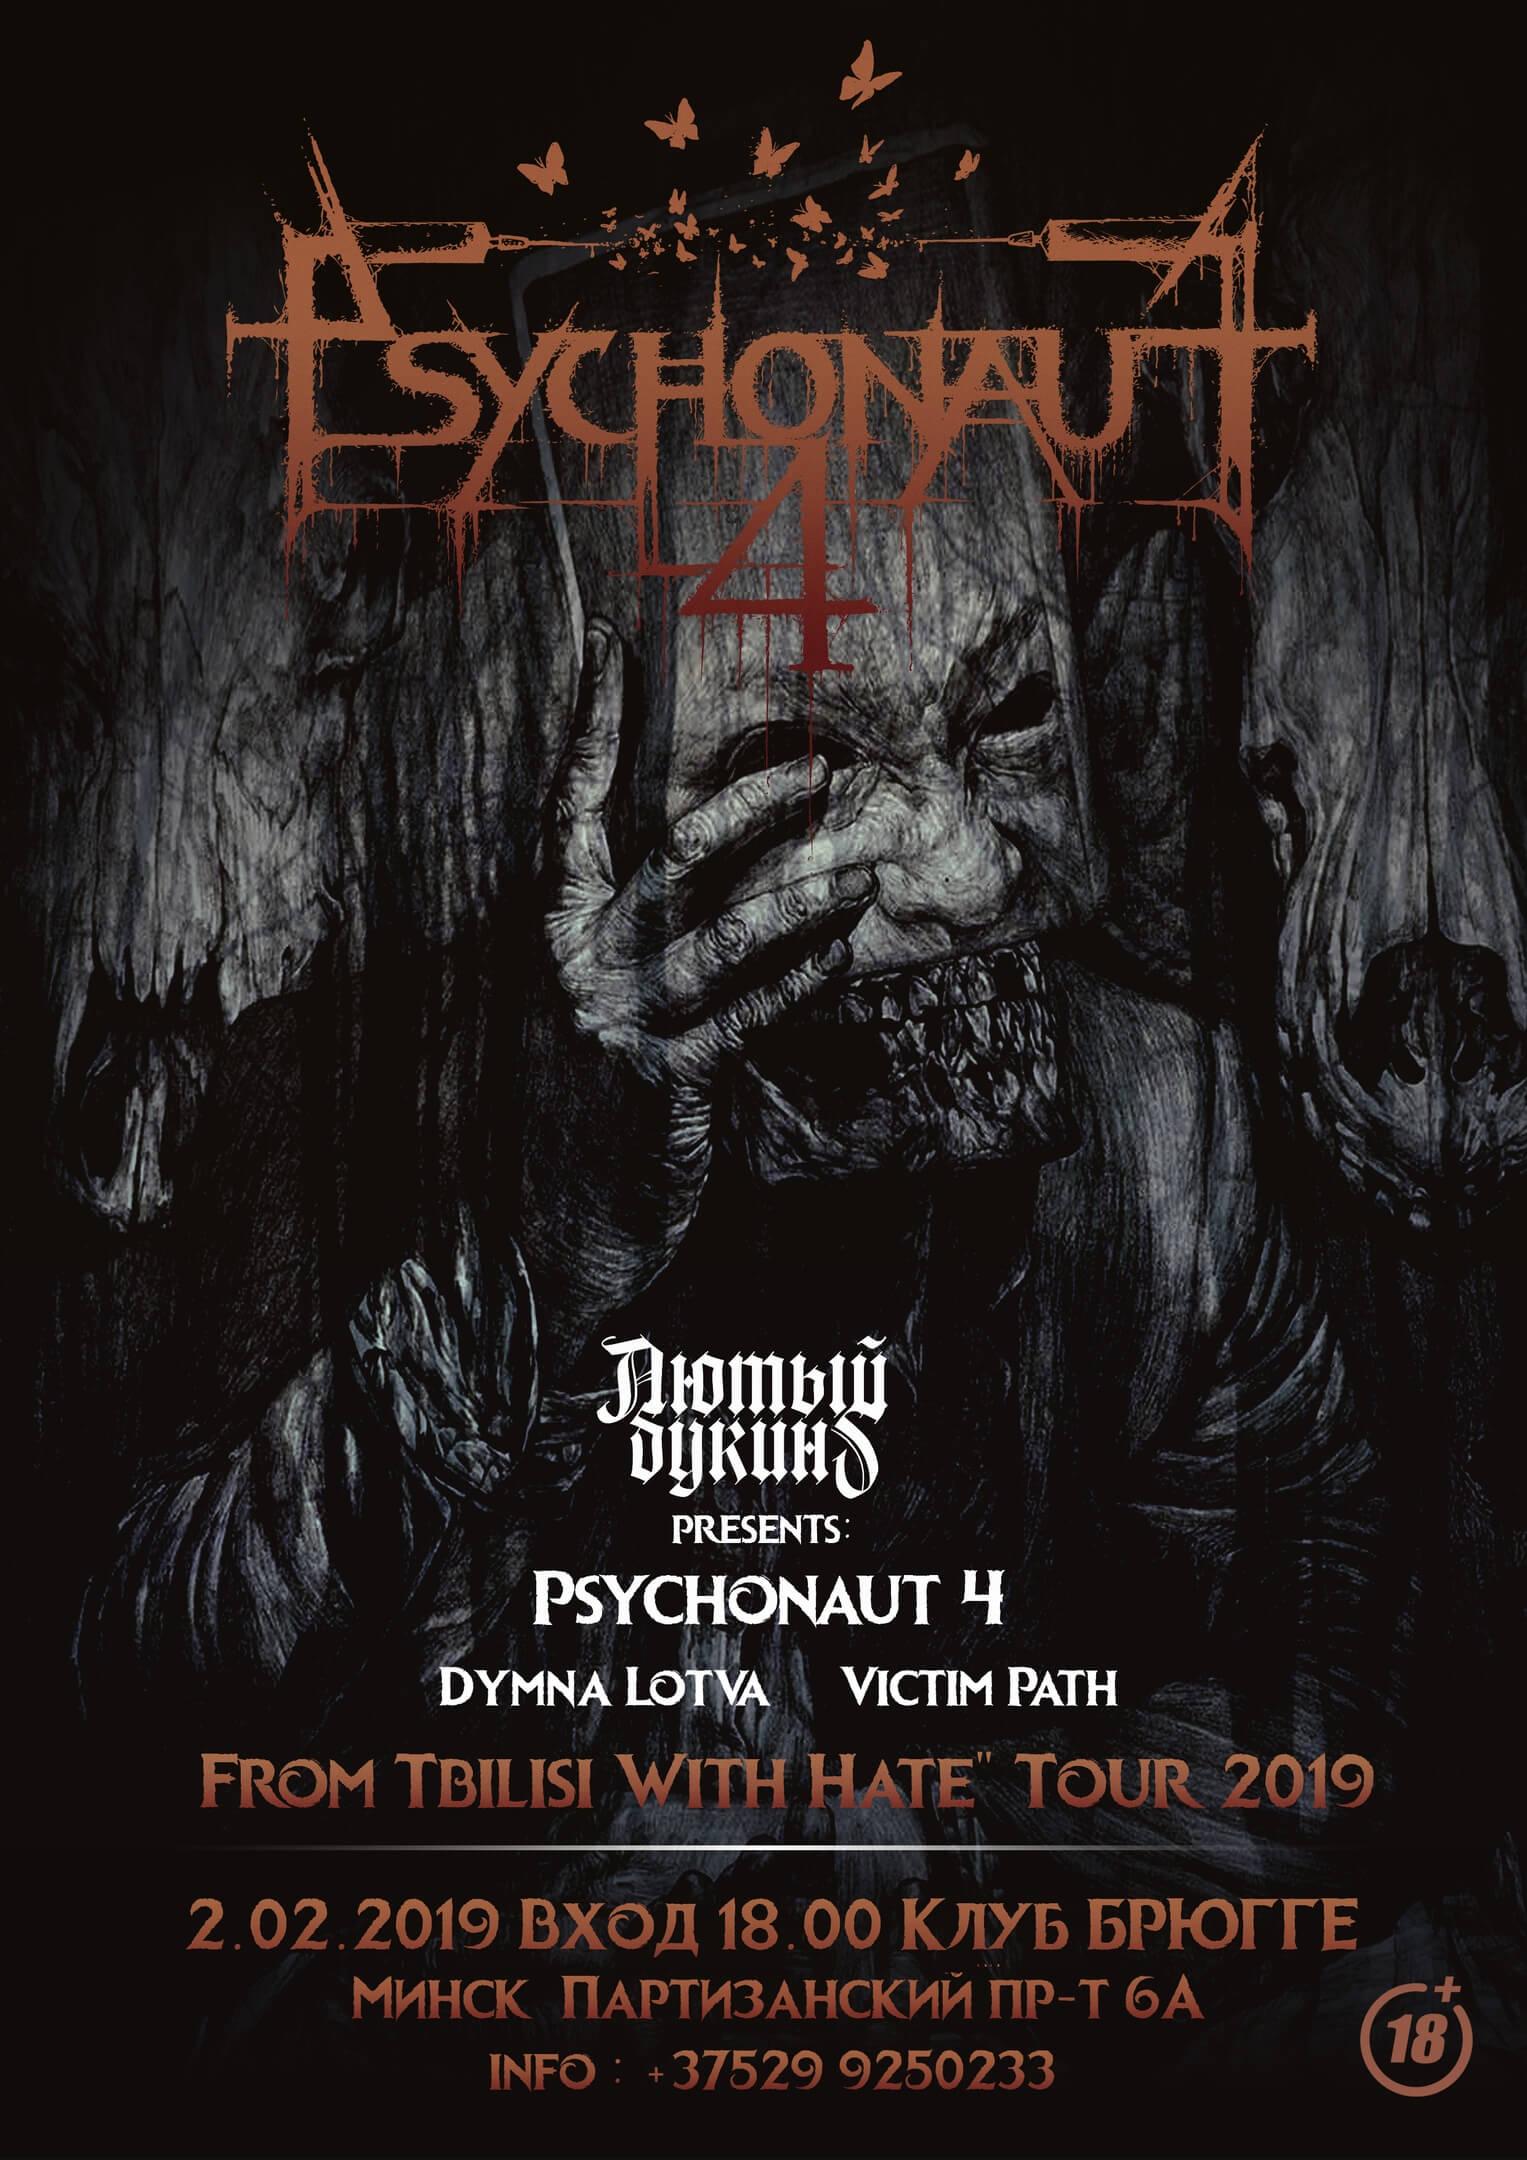 Psychonaut 4 Minsk